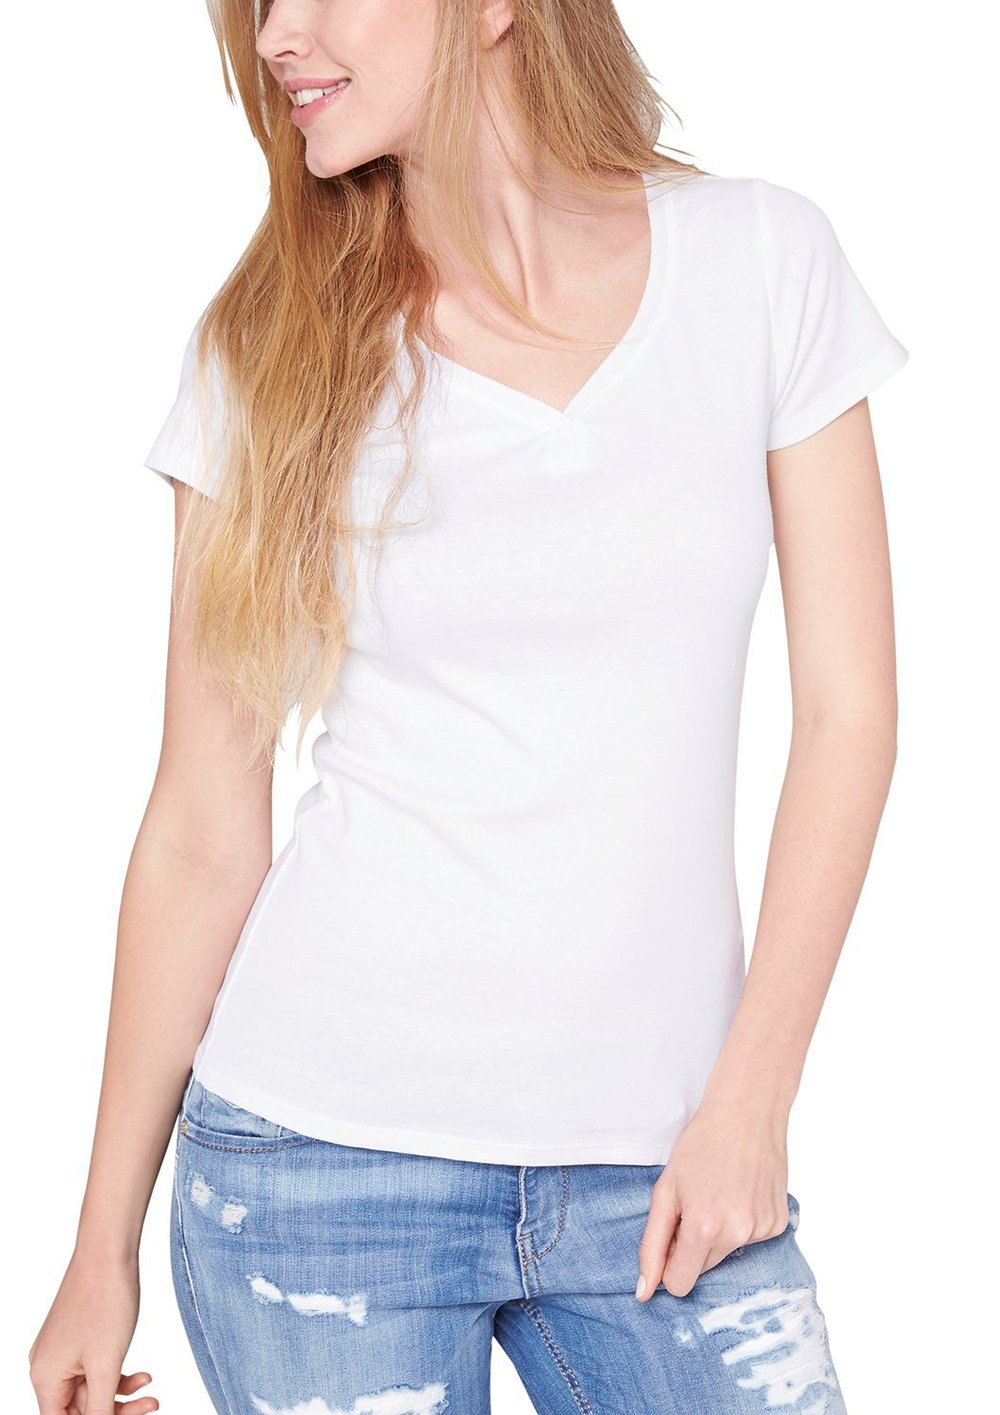 6bcf818f Women Plain White Tshirt,Custom T-shirt Lady V Neck,T Shirt Softextile -  Buy Women Plain White Tshirt,Custom T-shirt Lady V Neck,T Shirt Softextile  ...